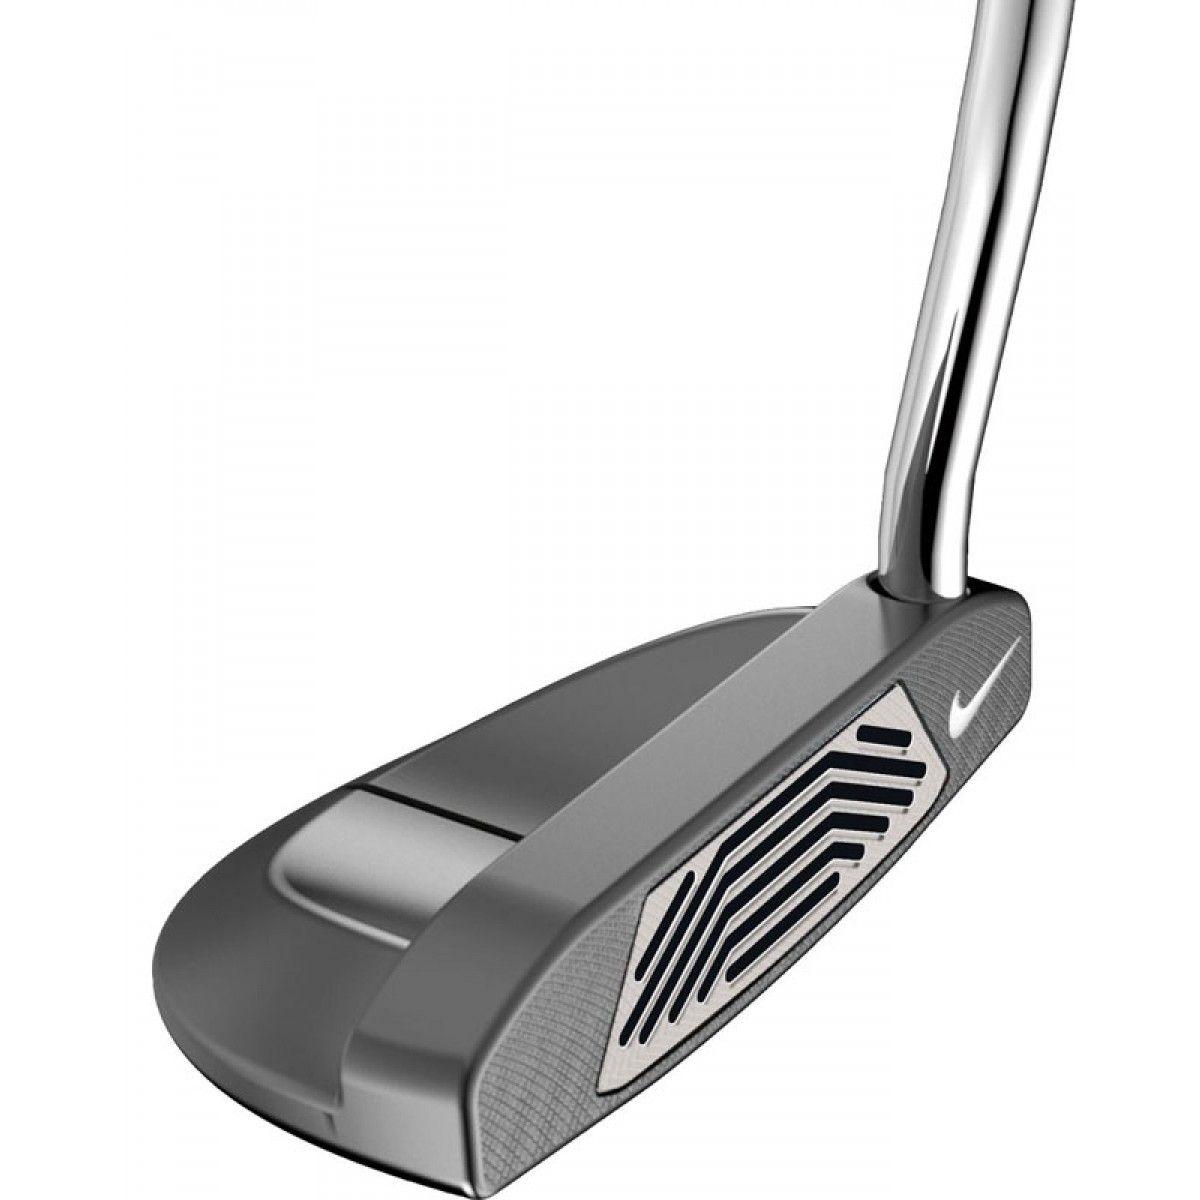 Desbordamiento Guante fe  Nike Method Core Putter MC5i ON SALE | Putter, Nike, Golf equipment